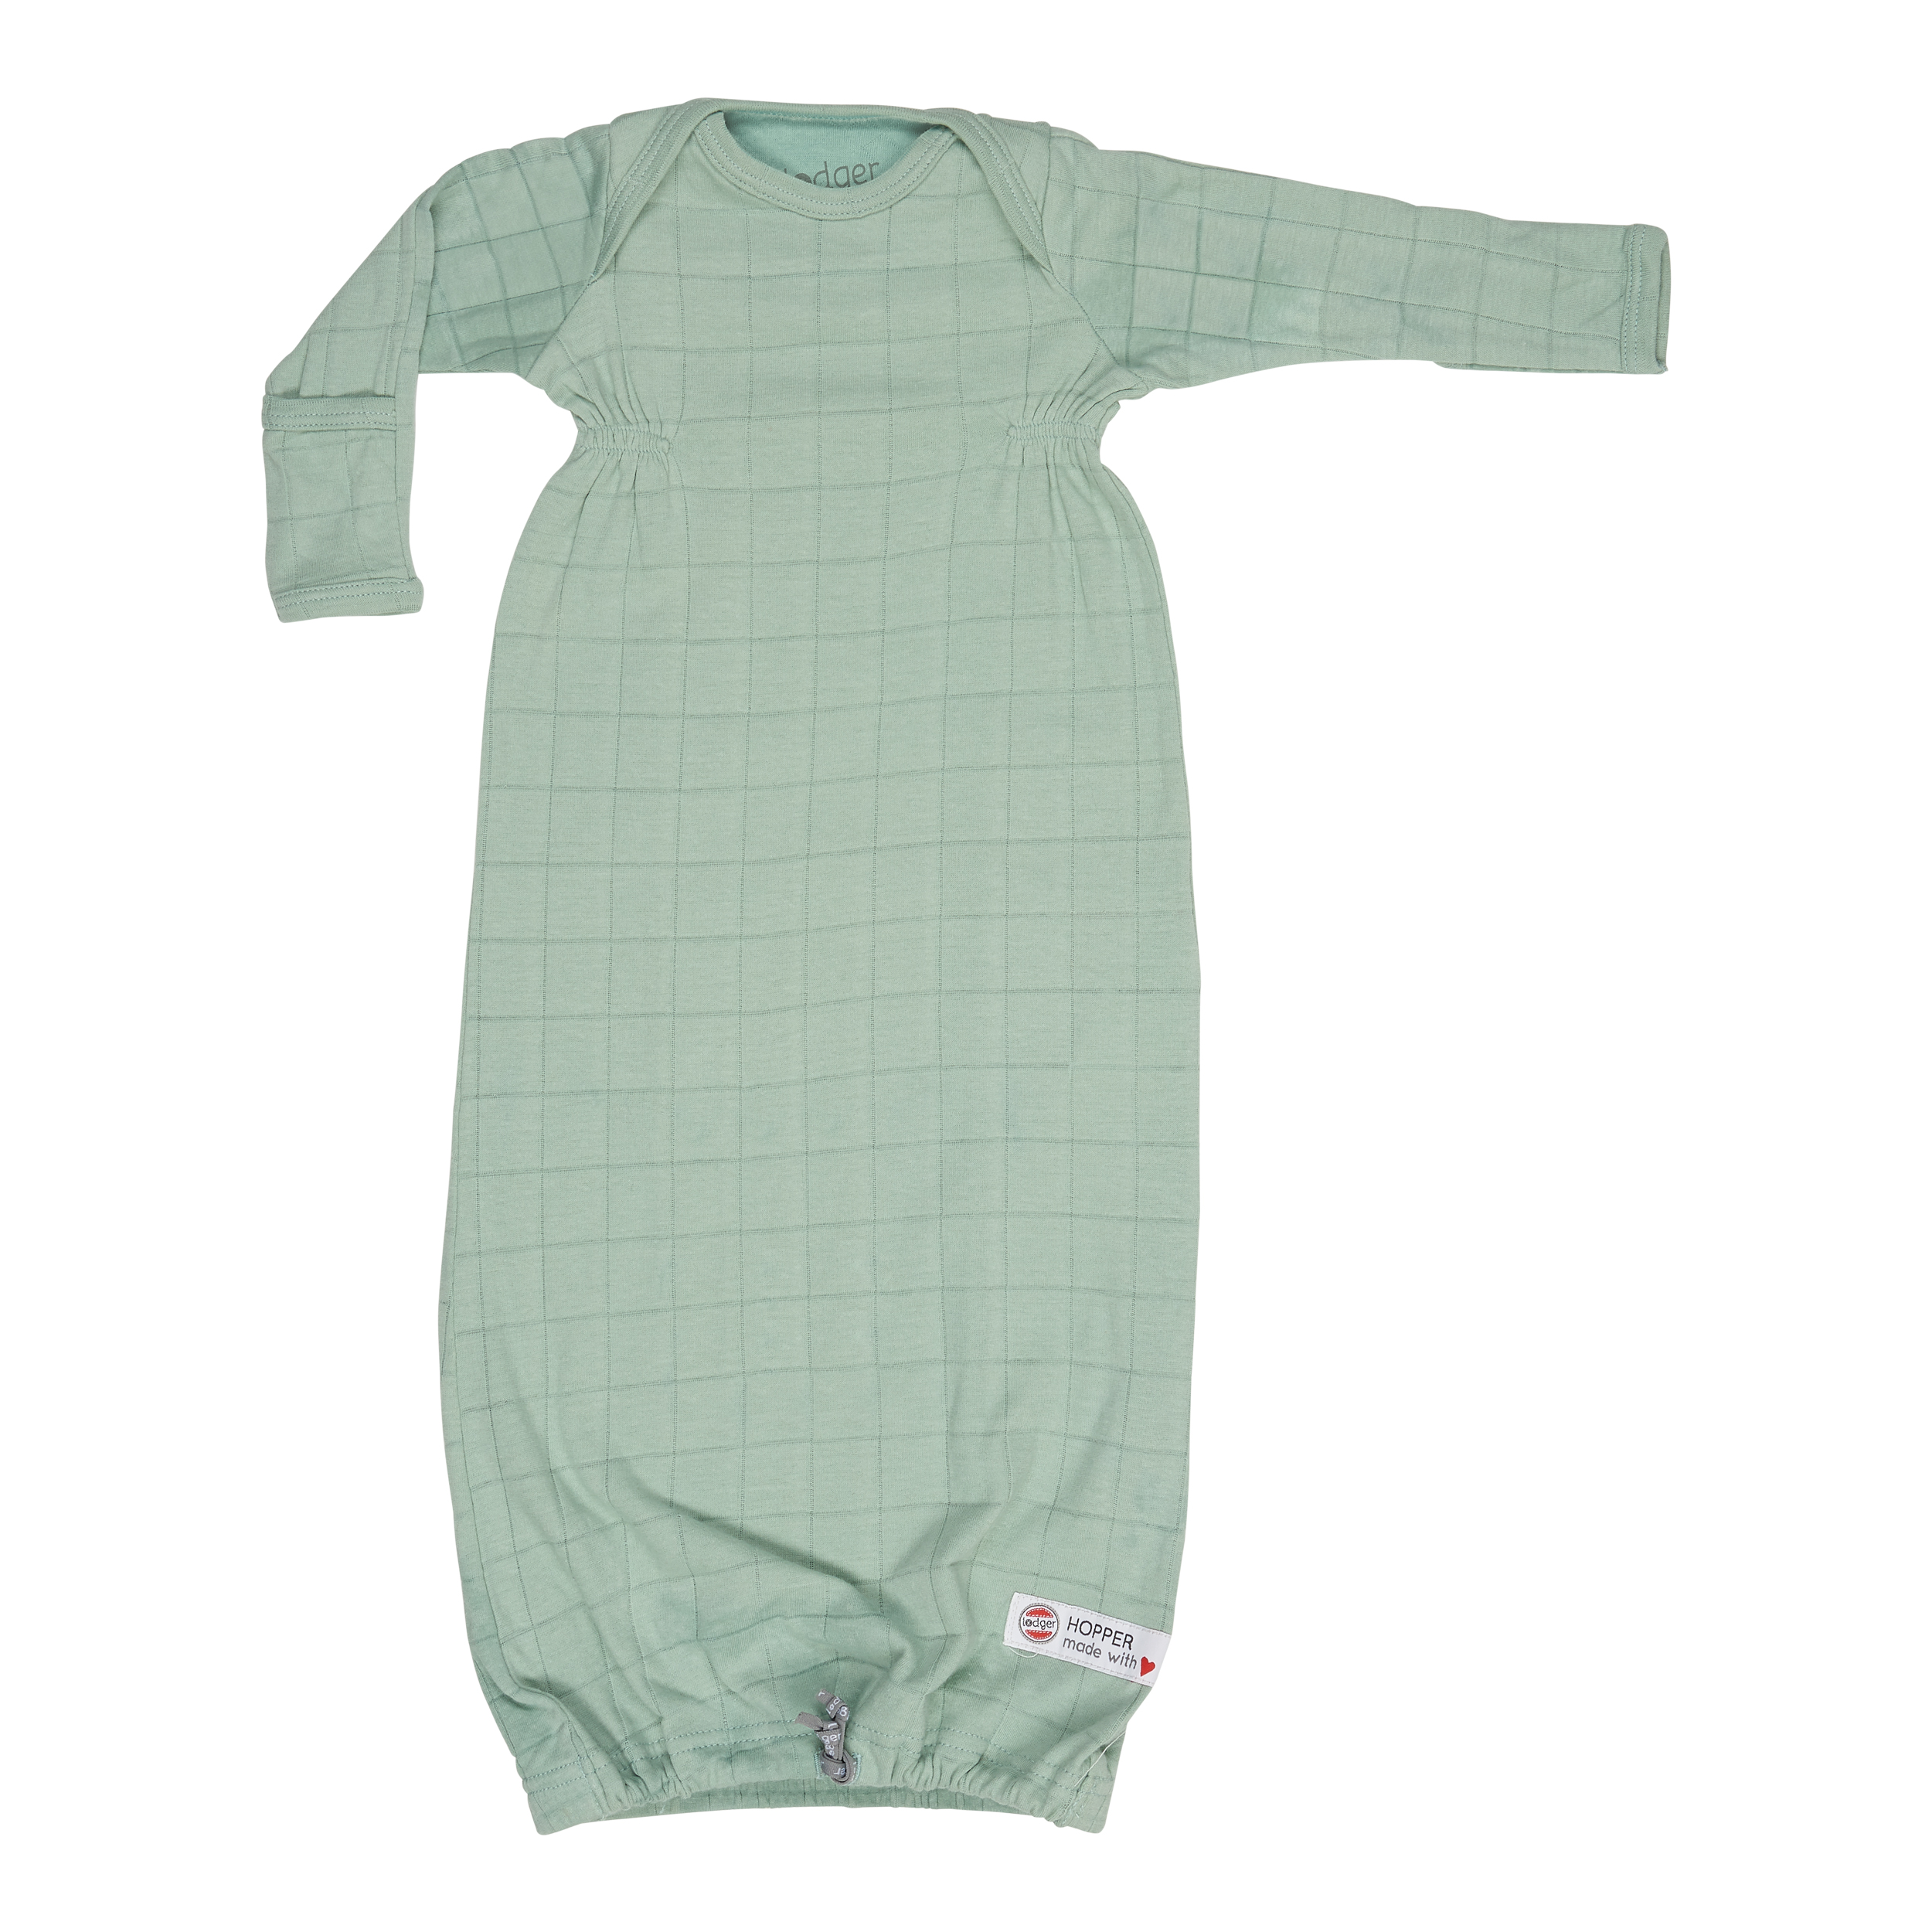 Hopper Newborn Solid Cotton Sleeping Bag For Babies